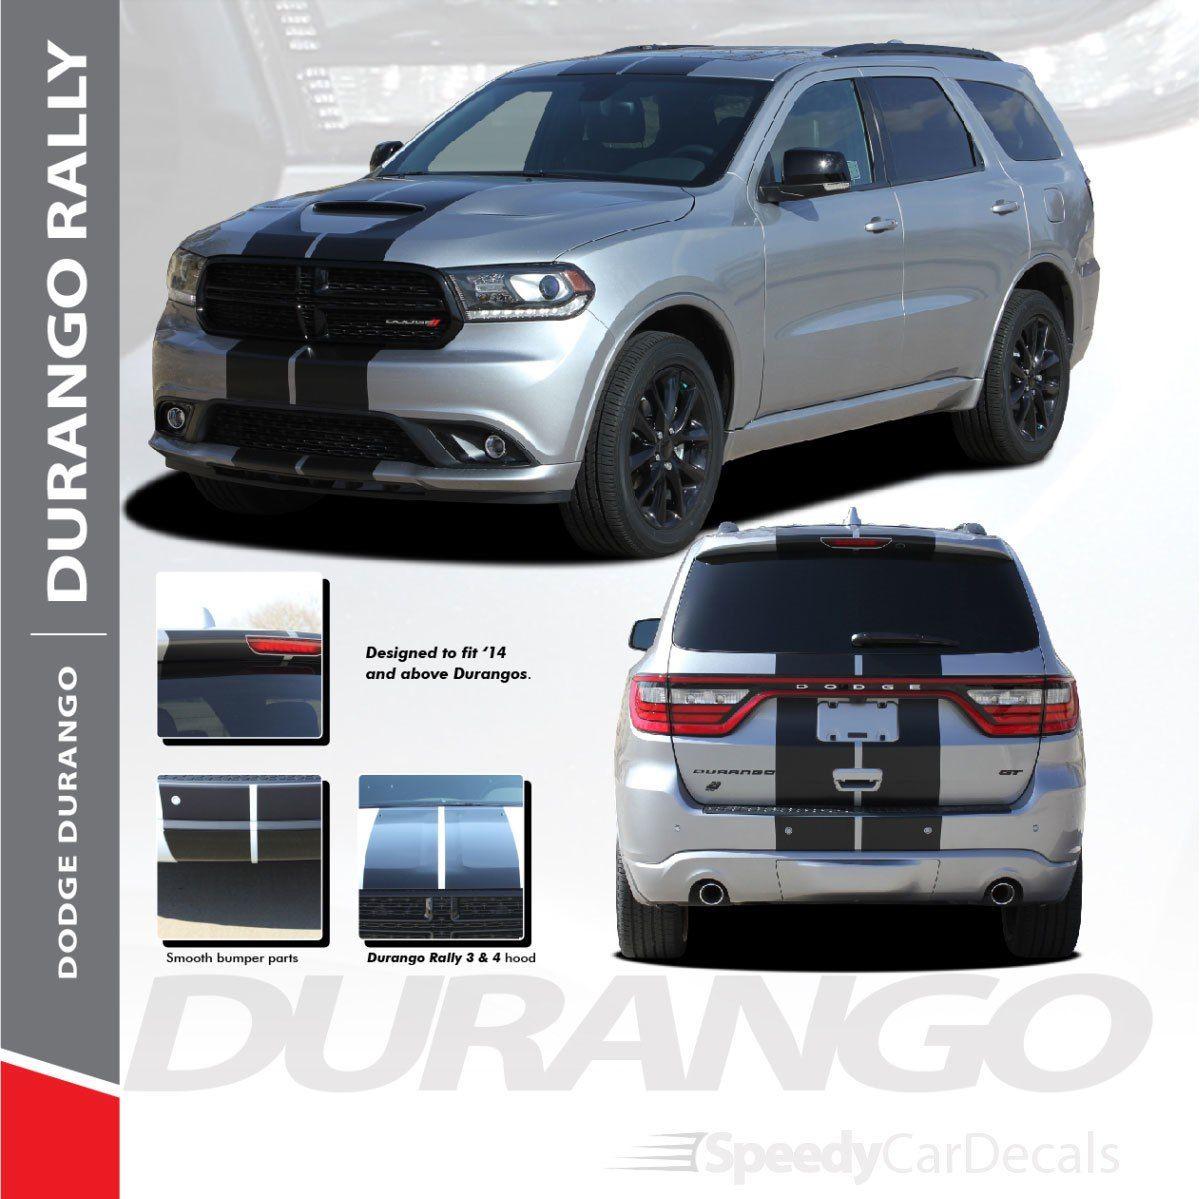 Dodge Durango Racing Stripes 3m Durango Rally 2014 2018 2019 2020 2021 Premium Auto Striping Dodge Durango Racing Stripes Vinyl Graphics